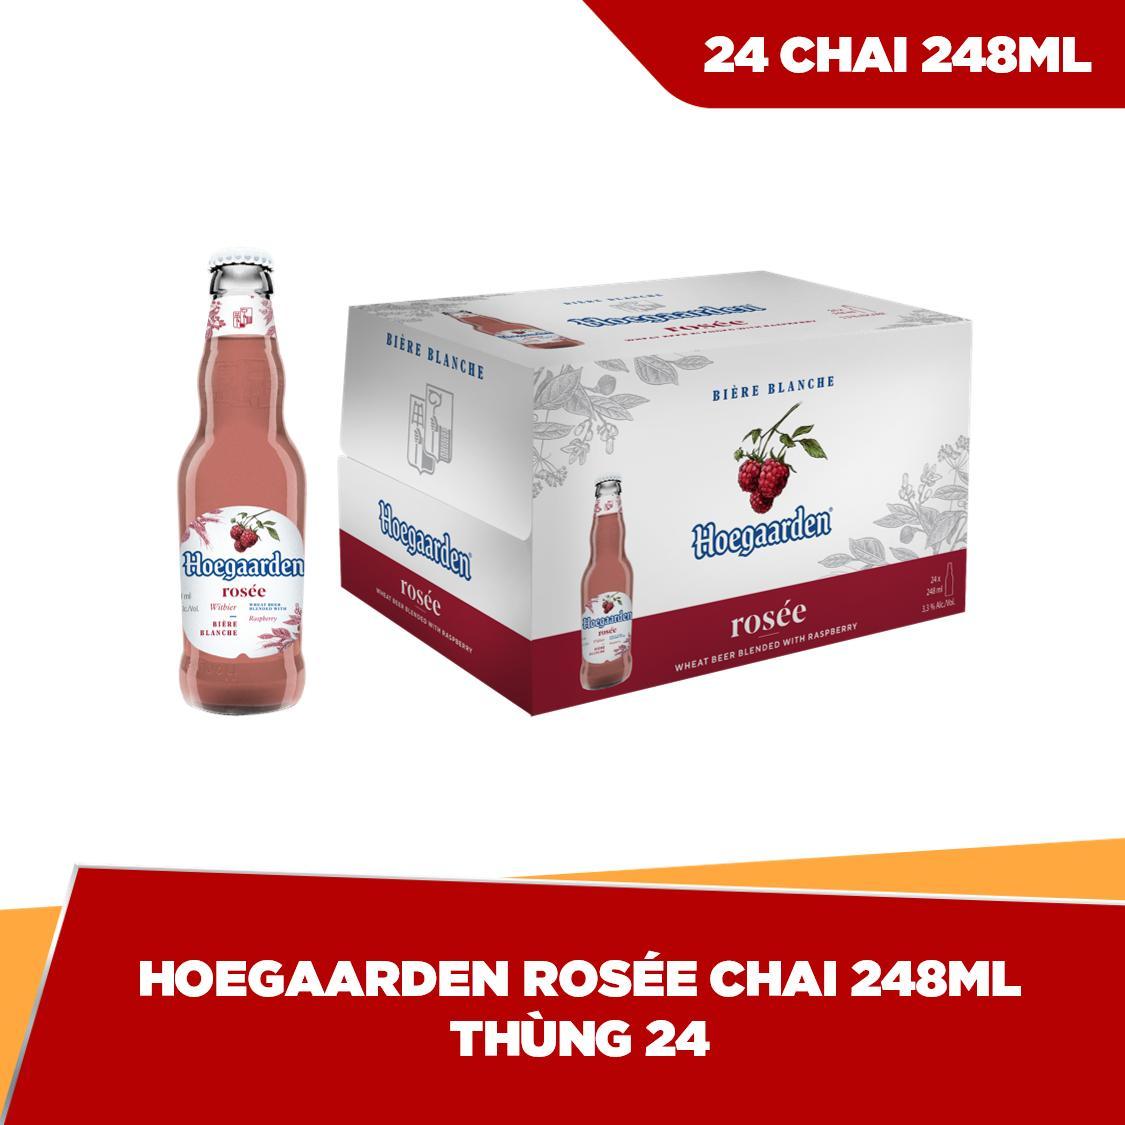 Coupon tại Lazada cho Hoegaarden Rosée Chai 248ml - Thùng 24